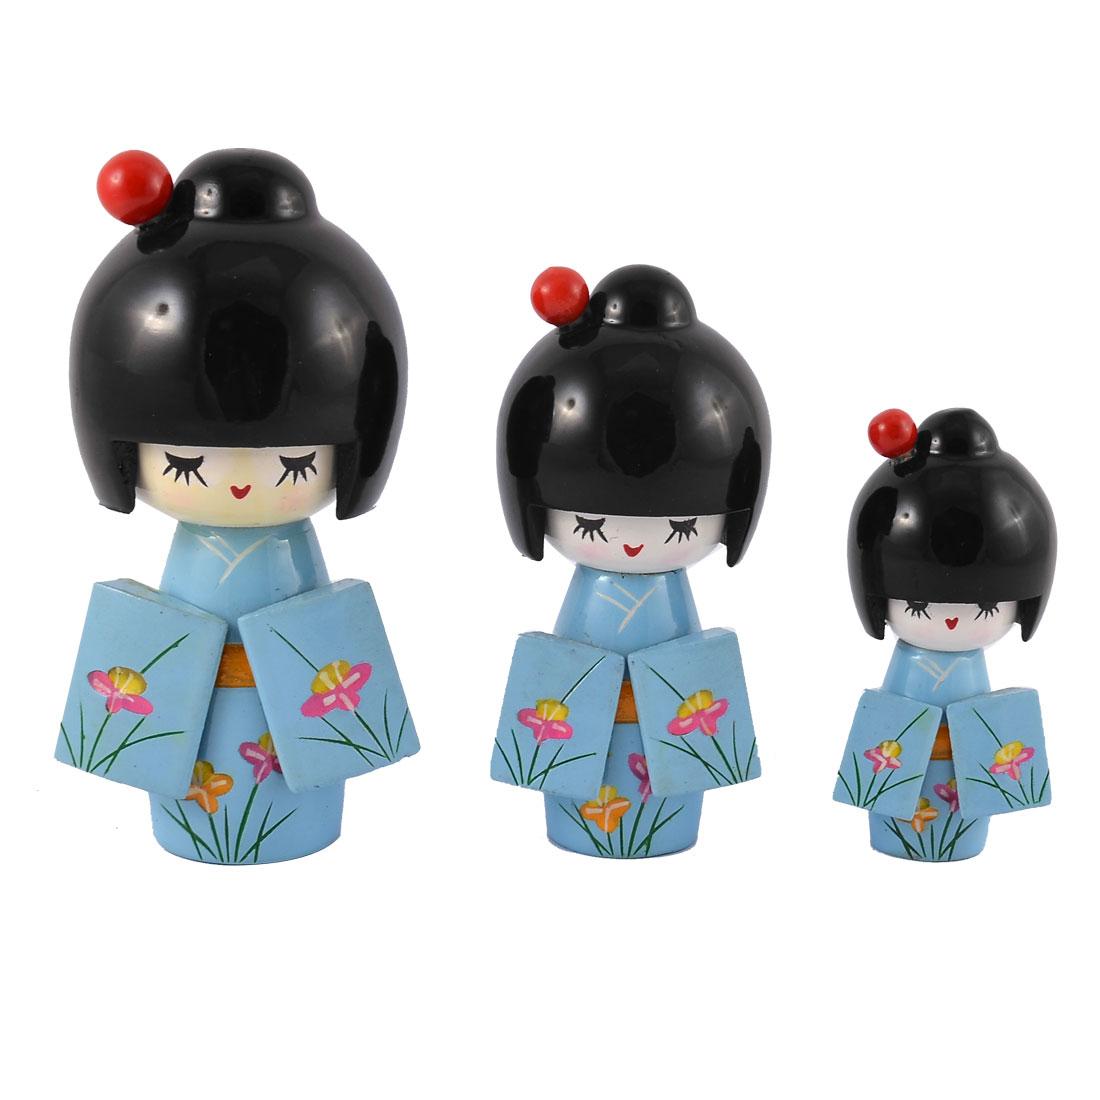 Home Wooden Japanese Doll Girl Desk Desktop Decoration Light Blue 3 in 1